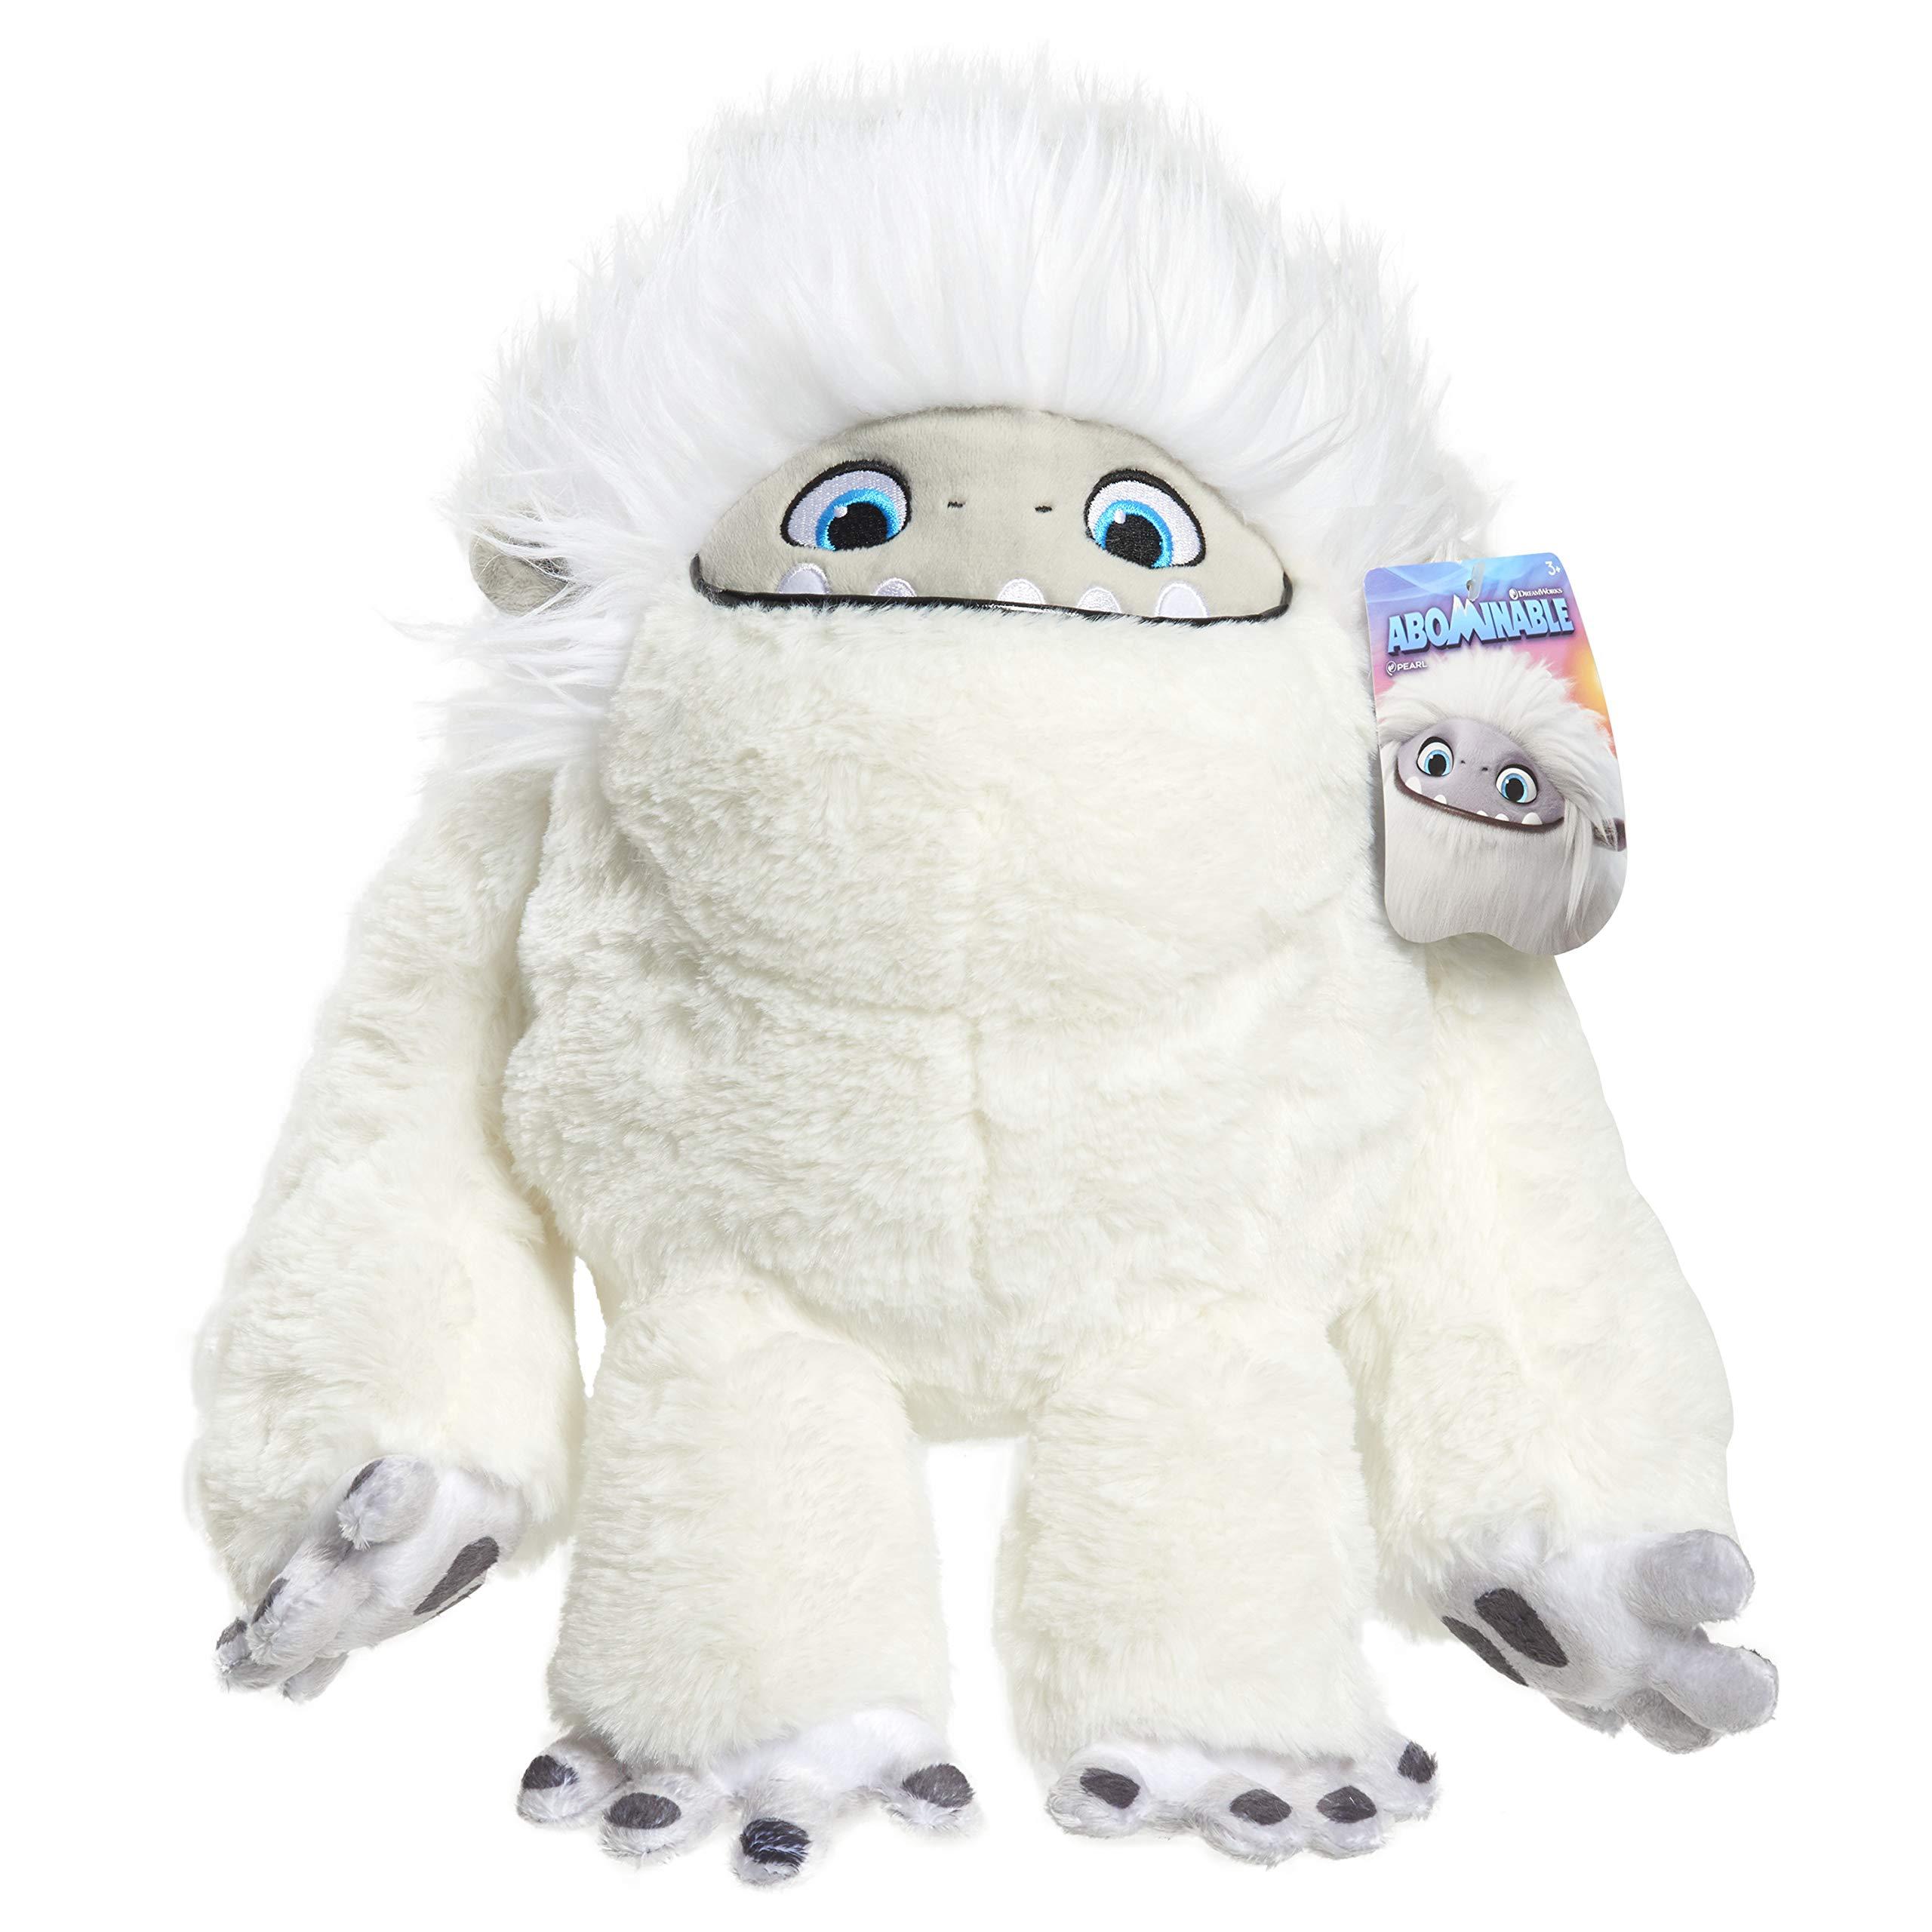 "Abominable Large 10"" Plush - Amazon Exclusive"